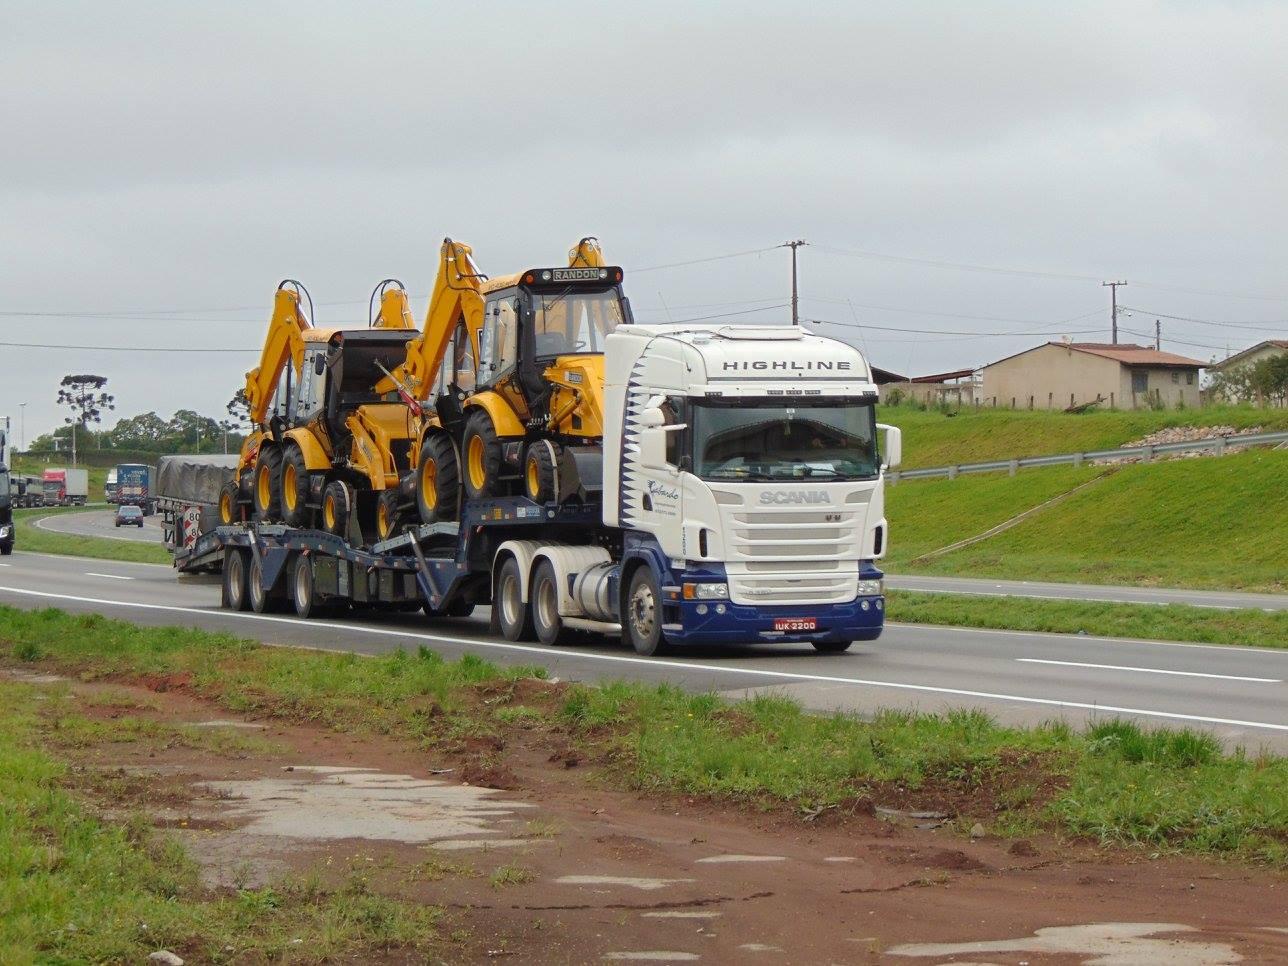 Scania-photo-5-1--2015-29